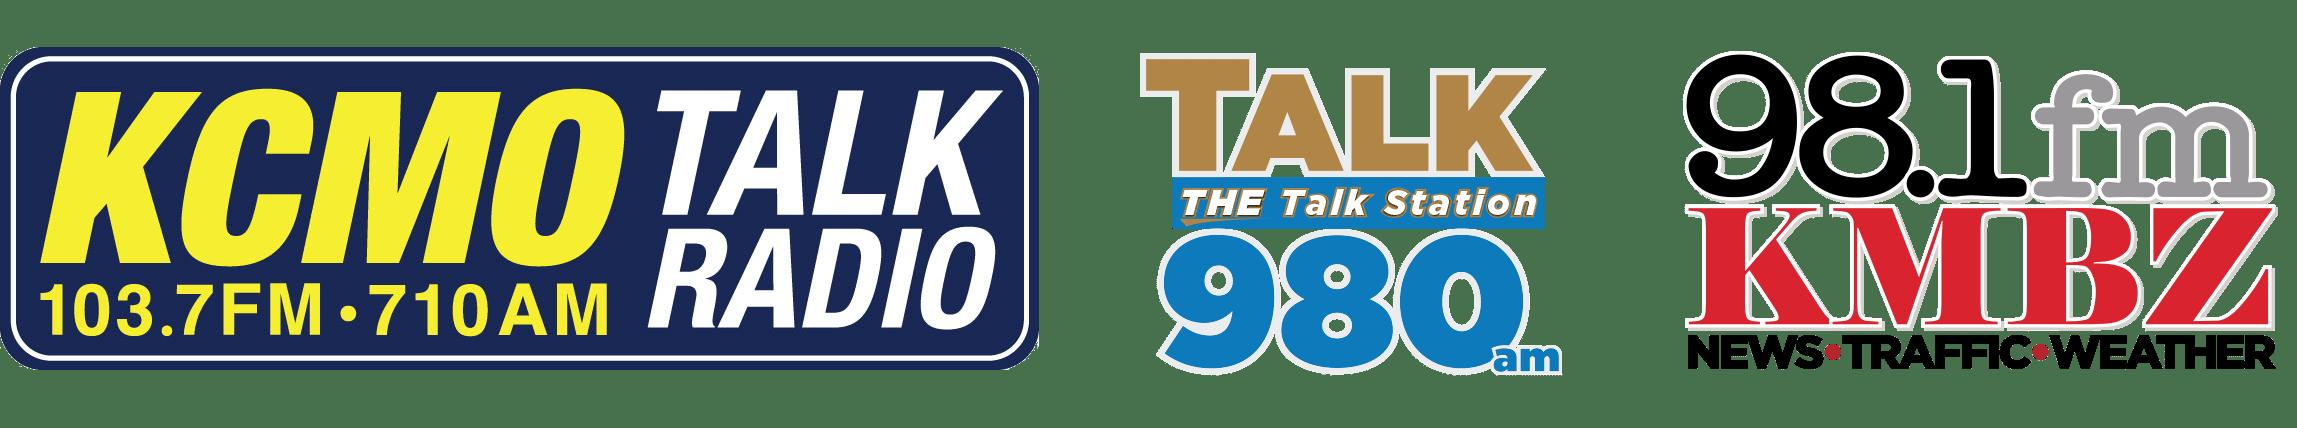 radioo-logos